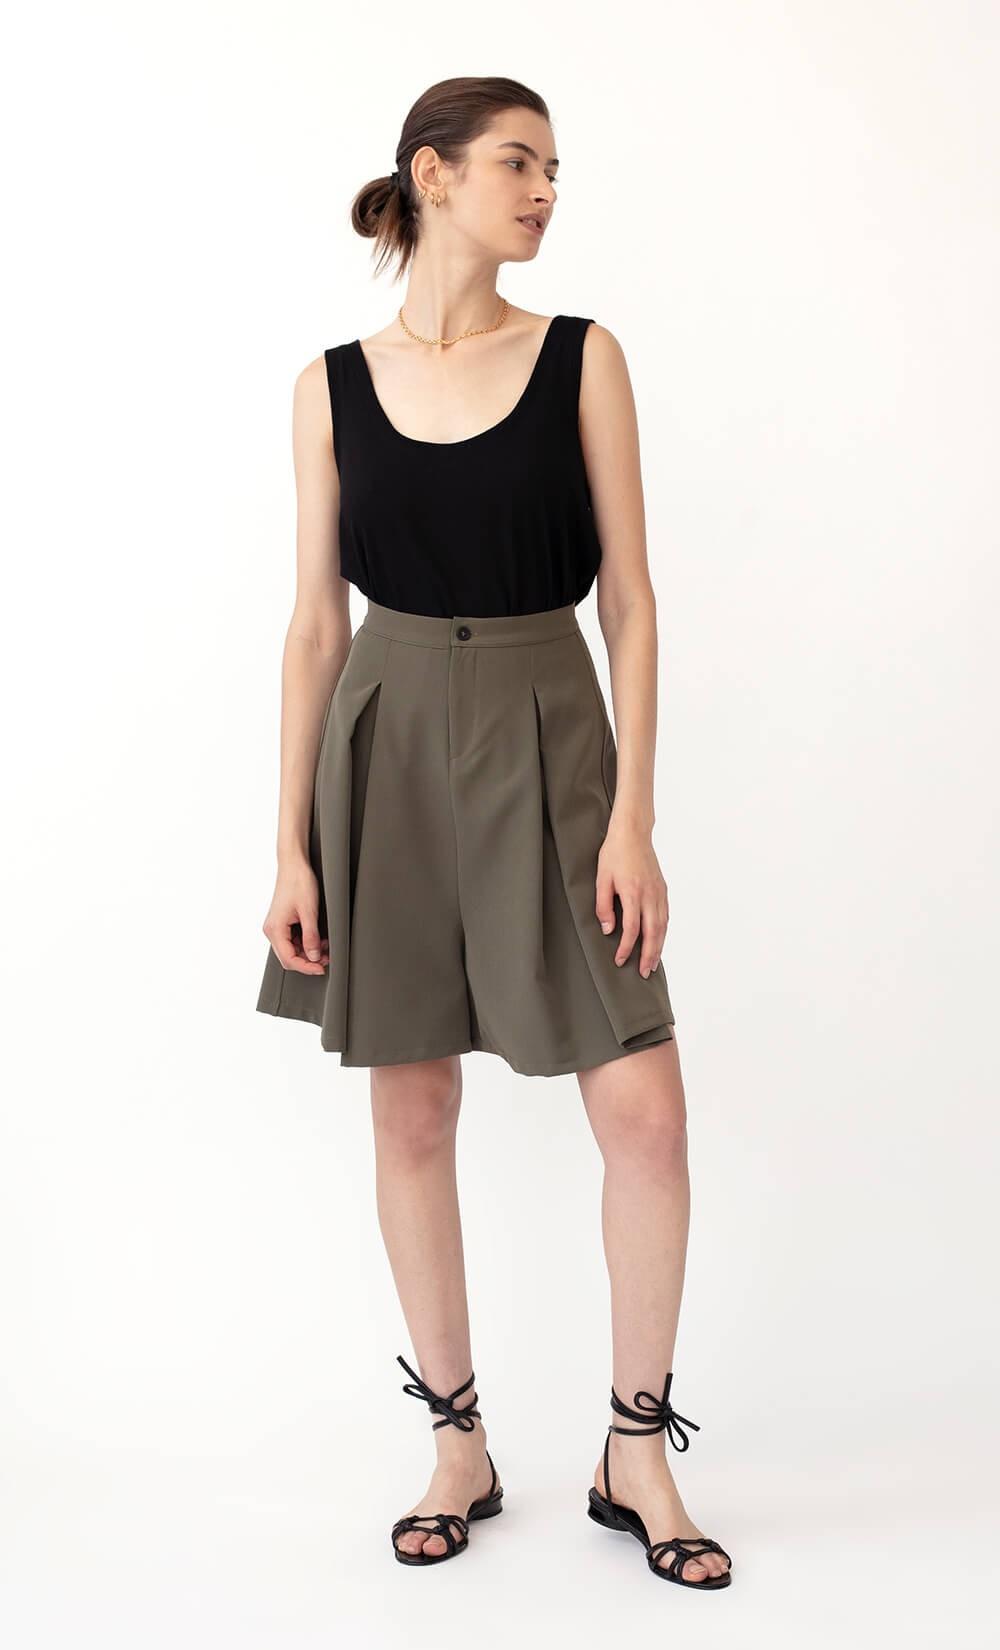 Gaucho Short Pants